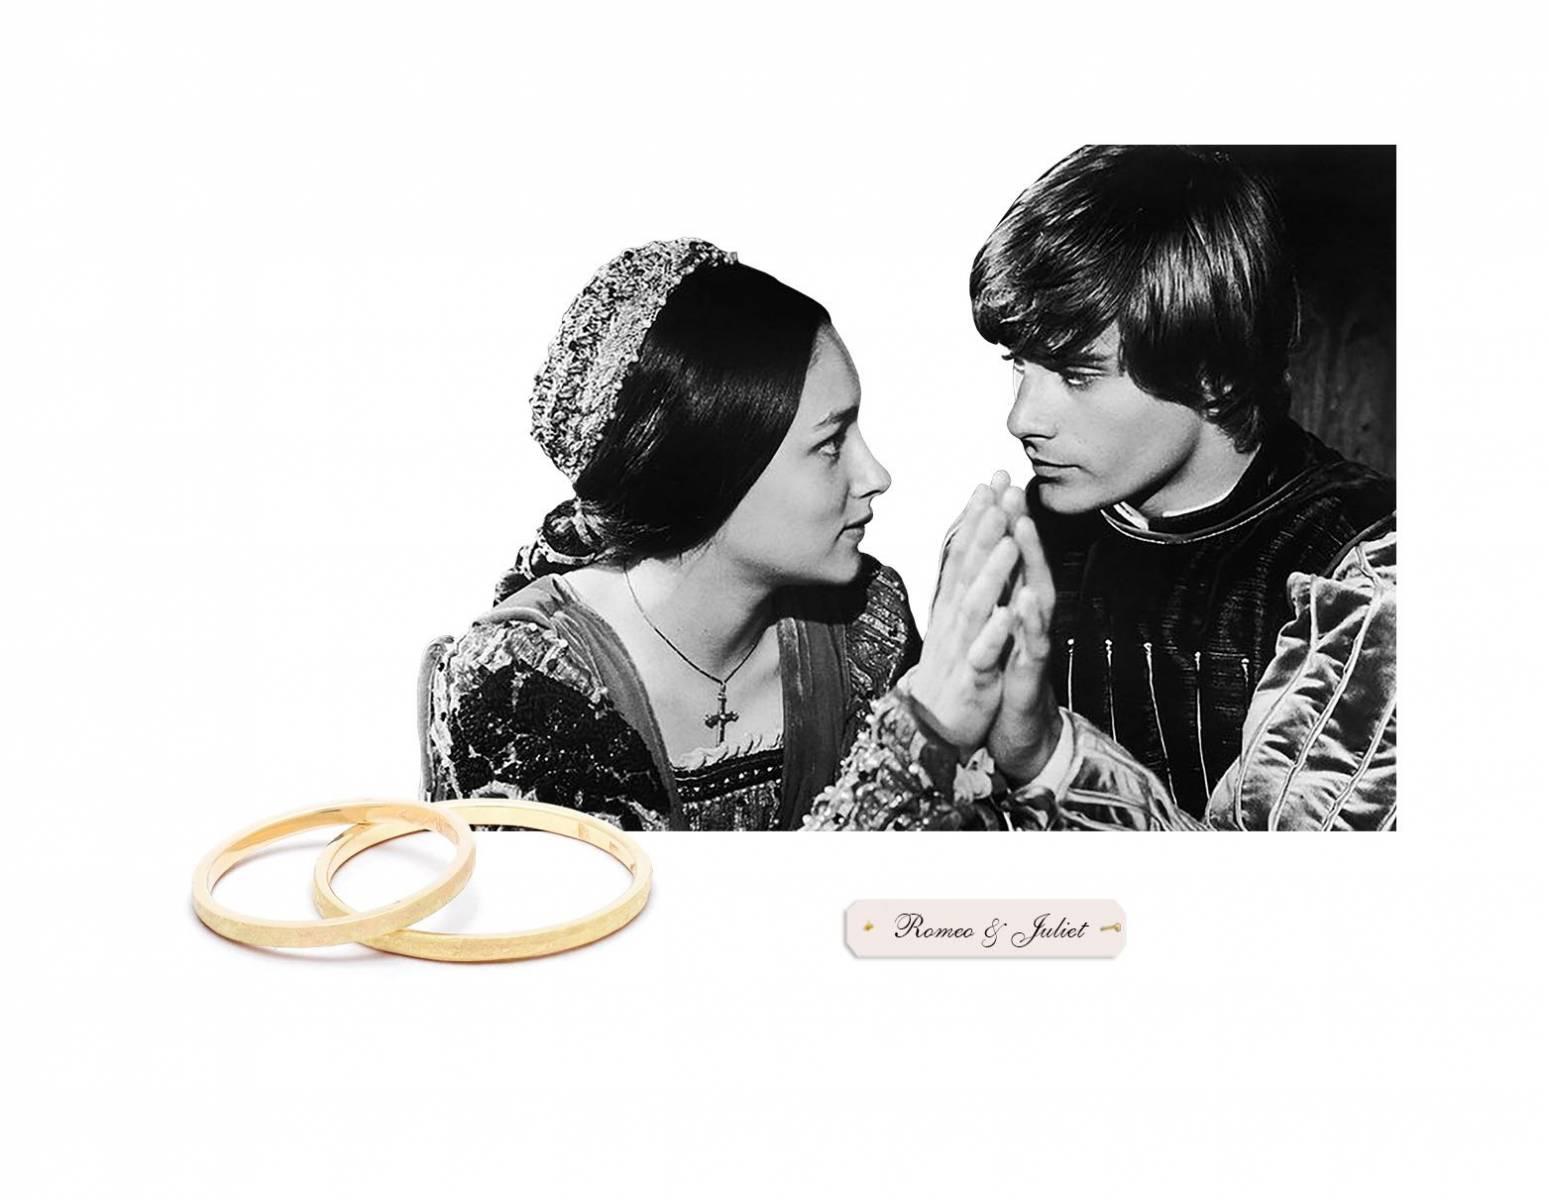 Wouters & Hendrix - Bruidsjuwelen - Verlovingsring - Trouwring - House of Events - 35